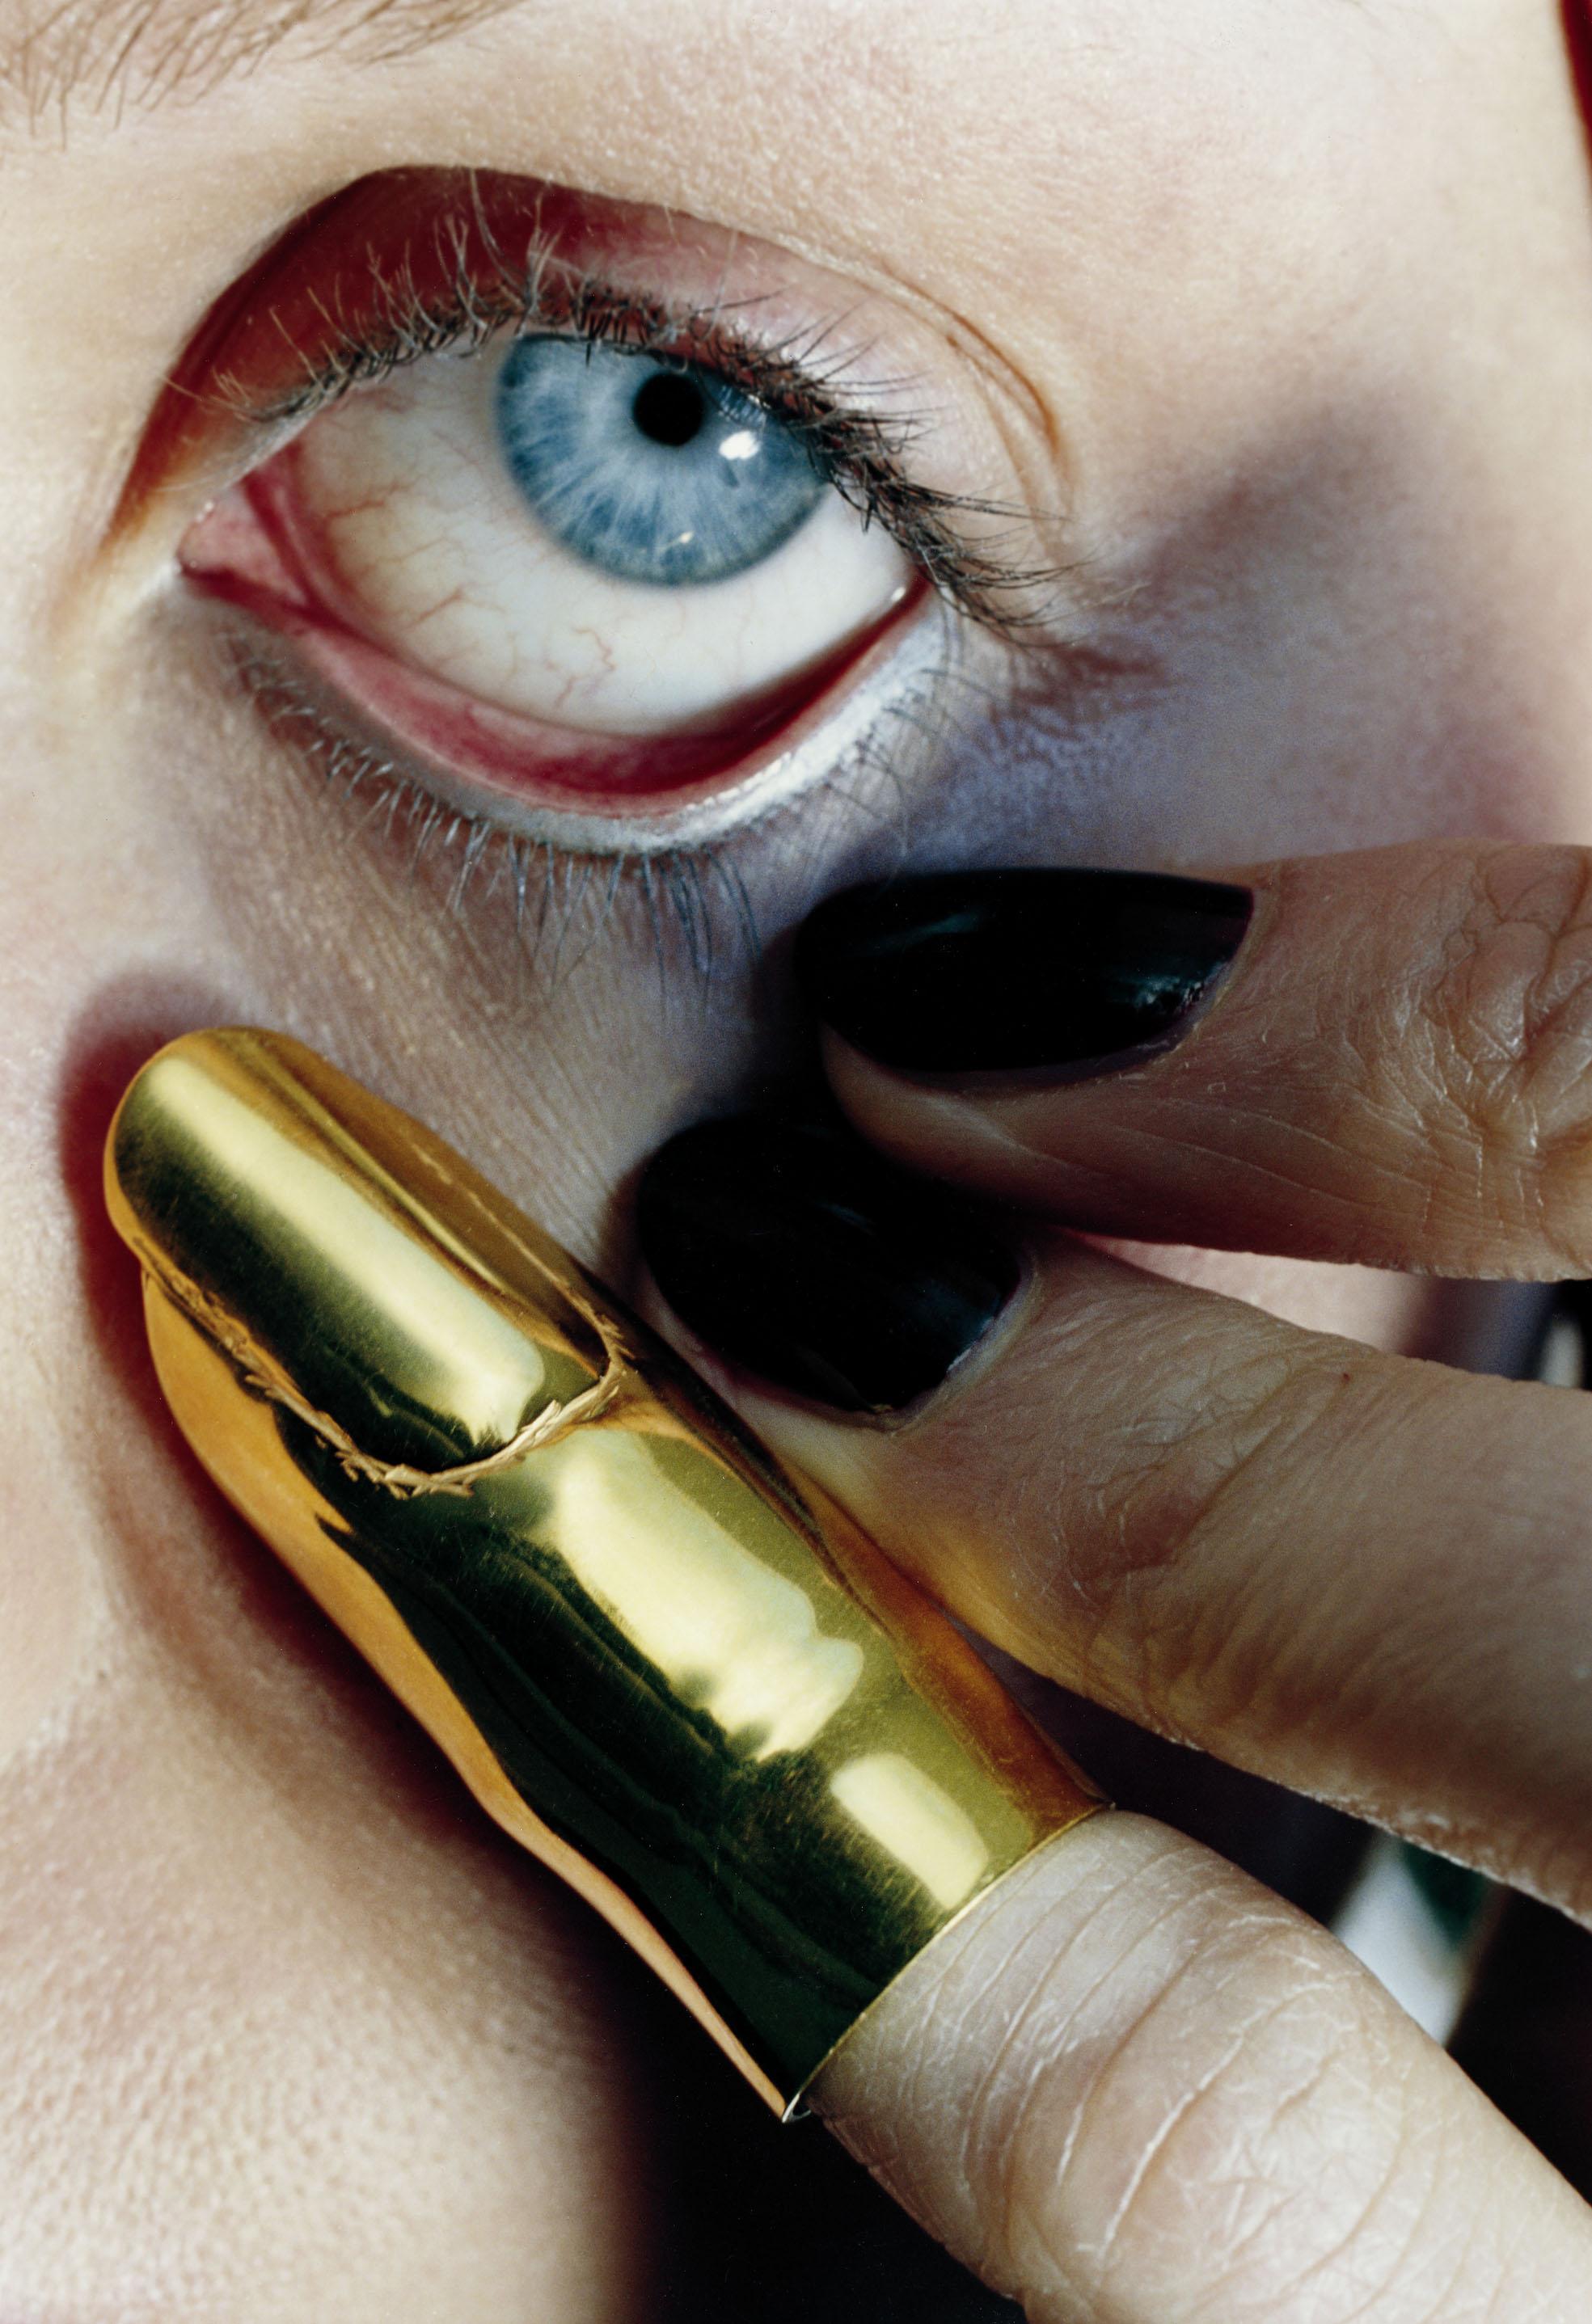 Helmut Newton - American Vogue (Monte Carlo 1995) copyright Helmut Newton Estate.